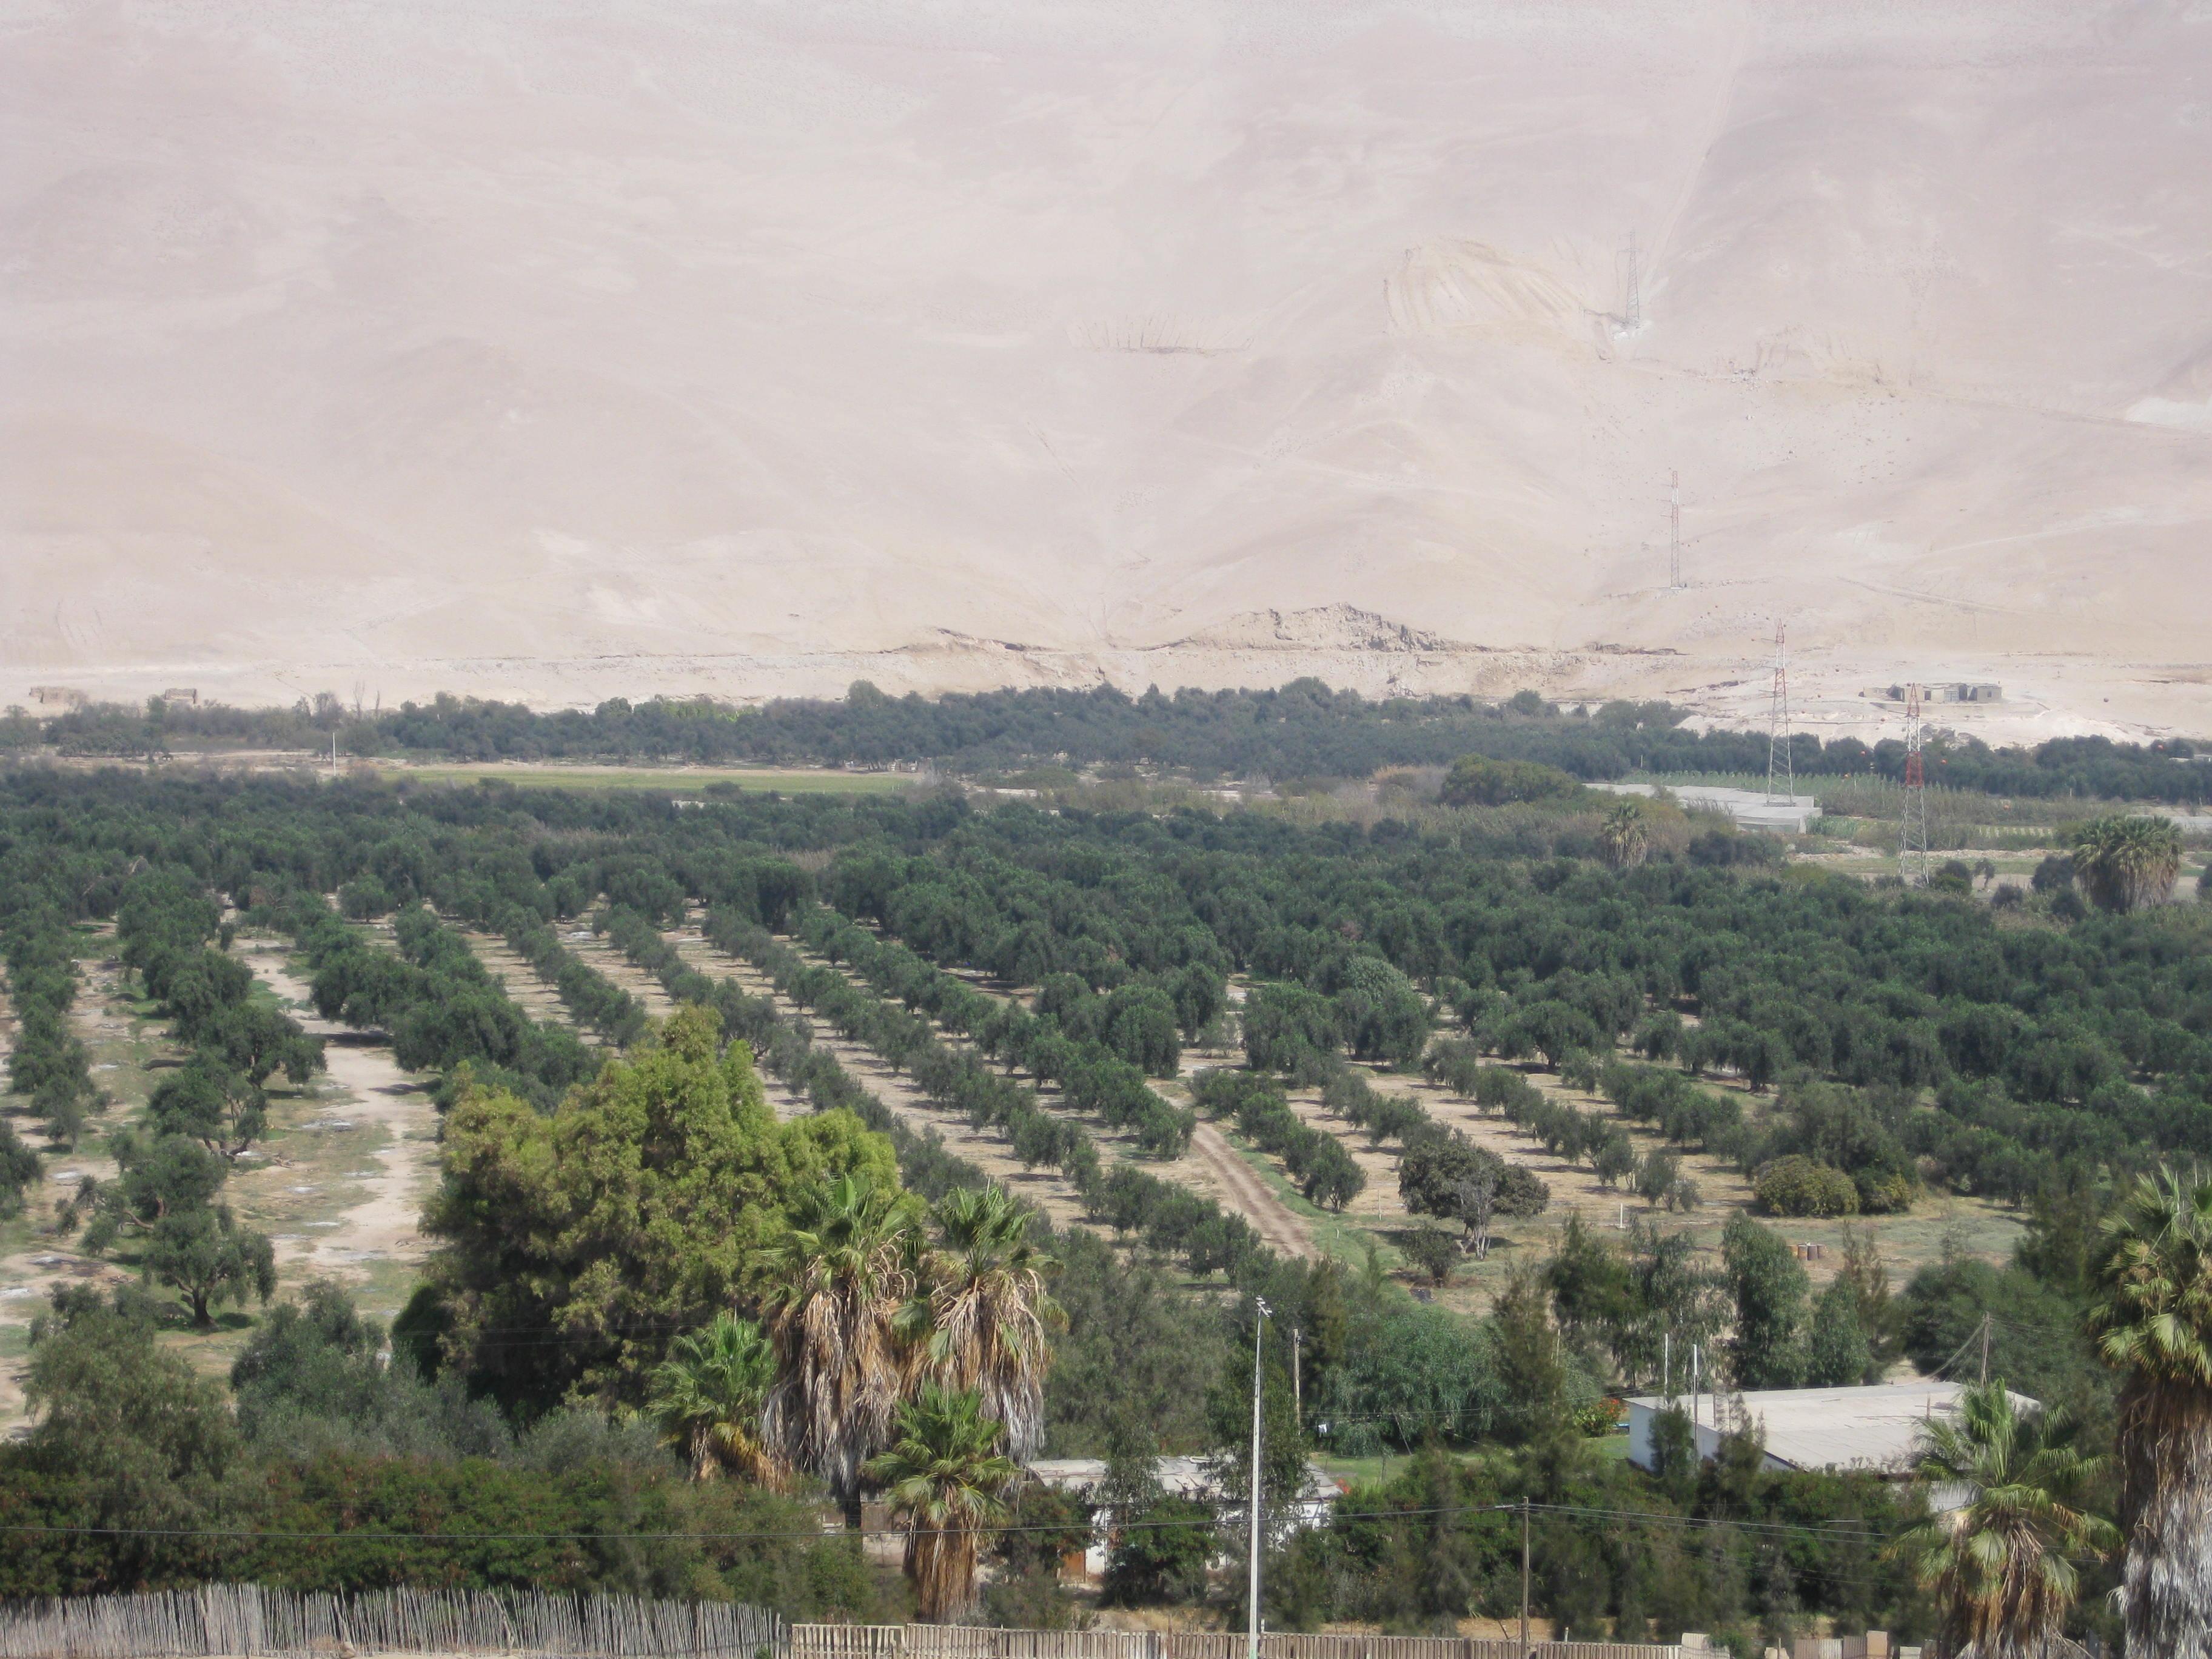 Olive Trees in Azapa Valley in the Atacama Desert